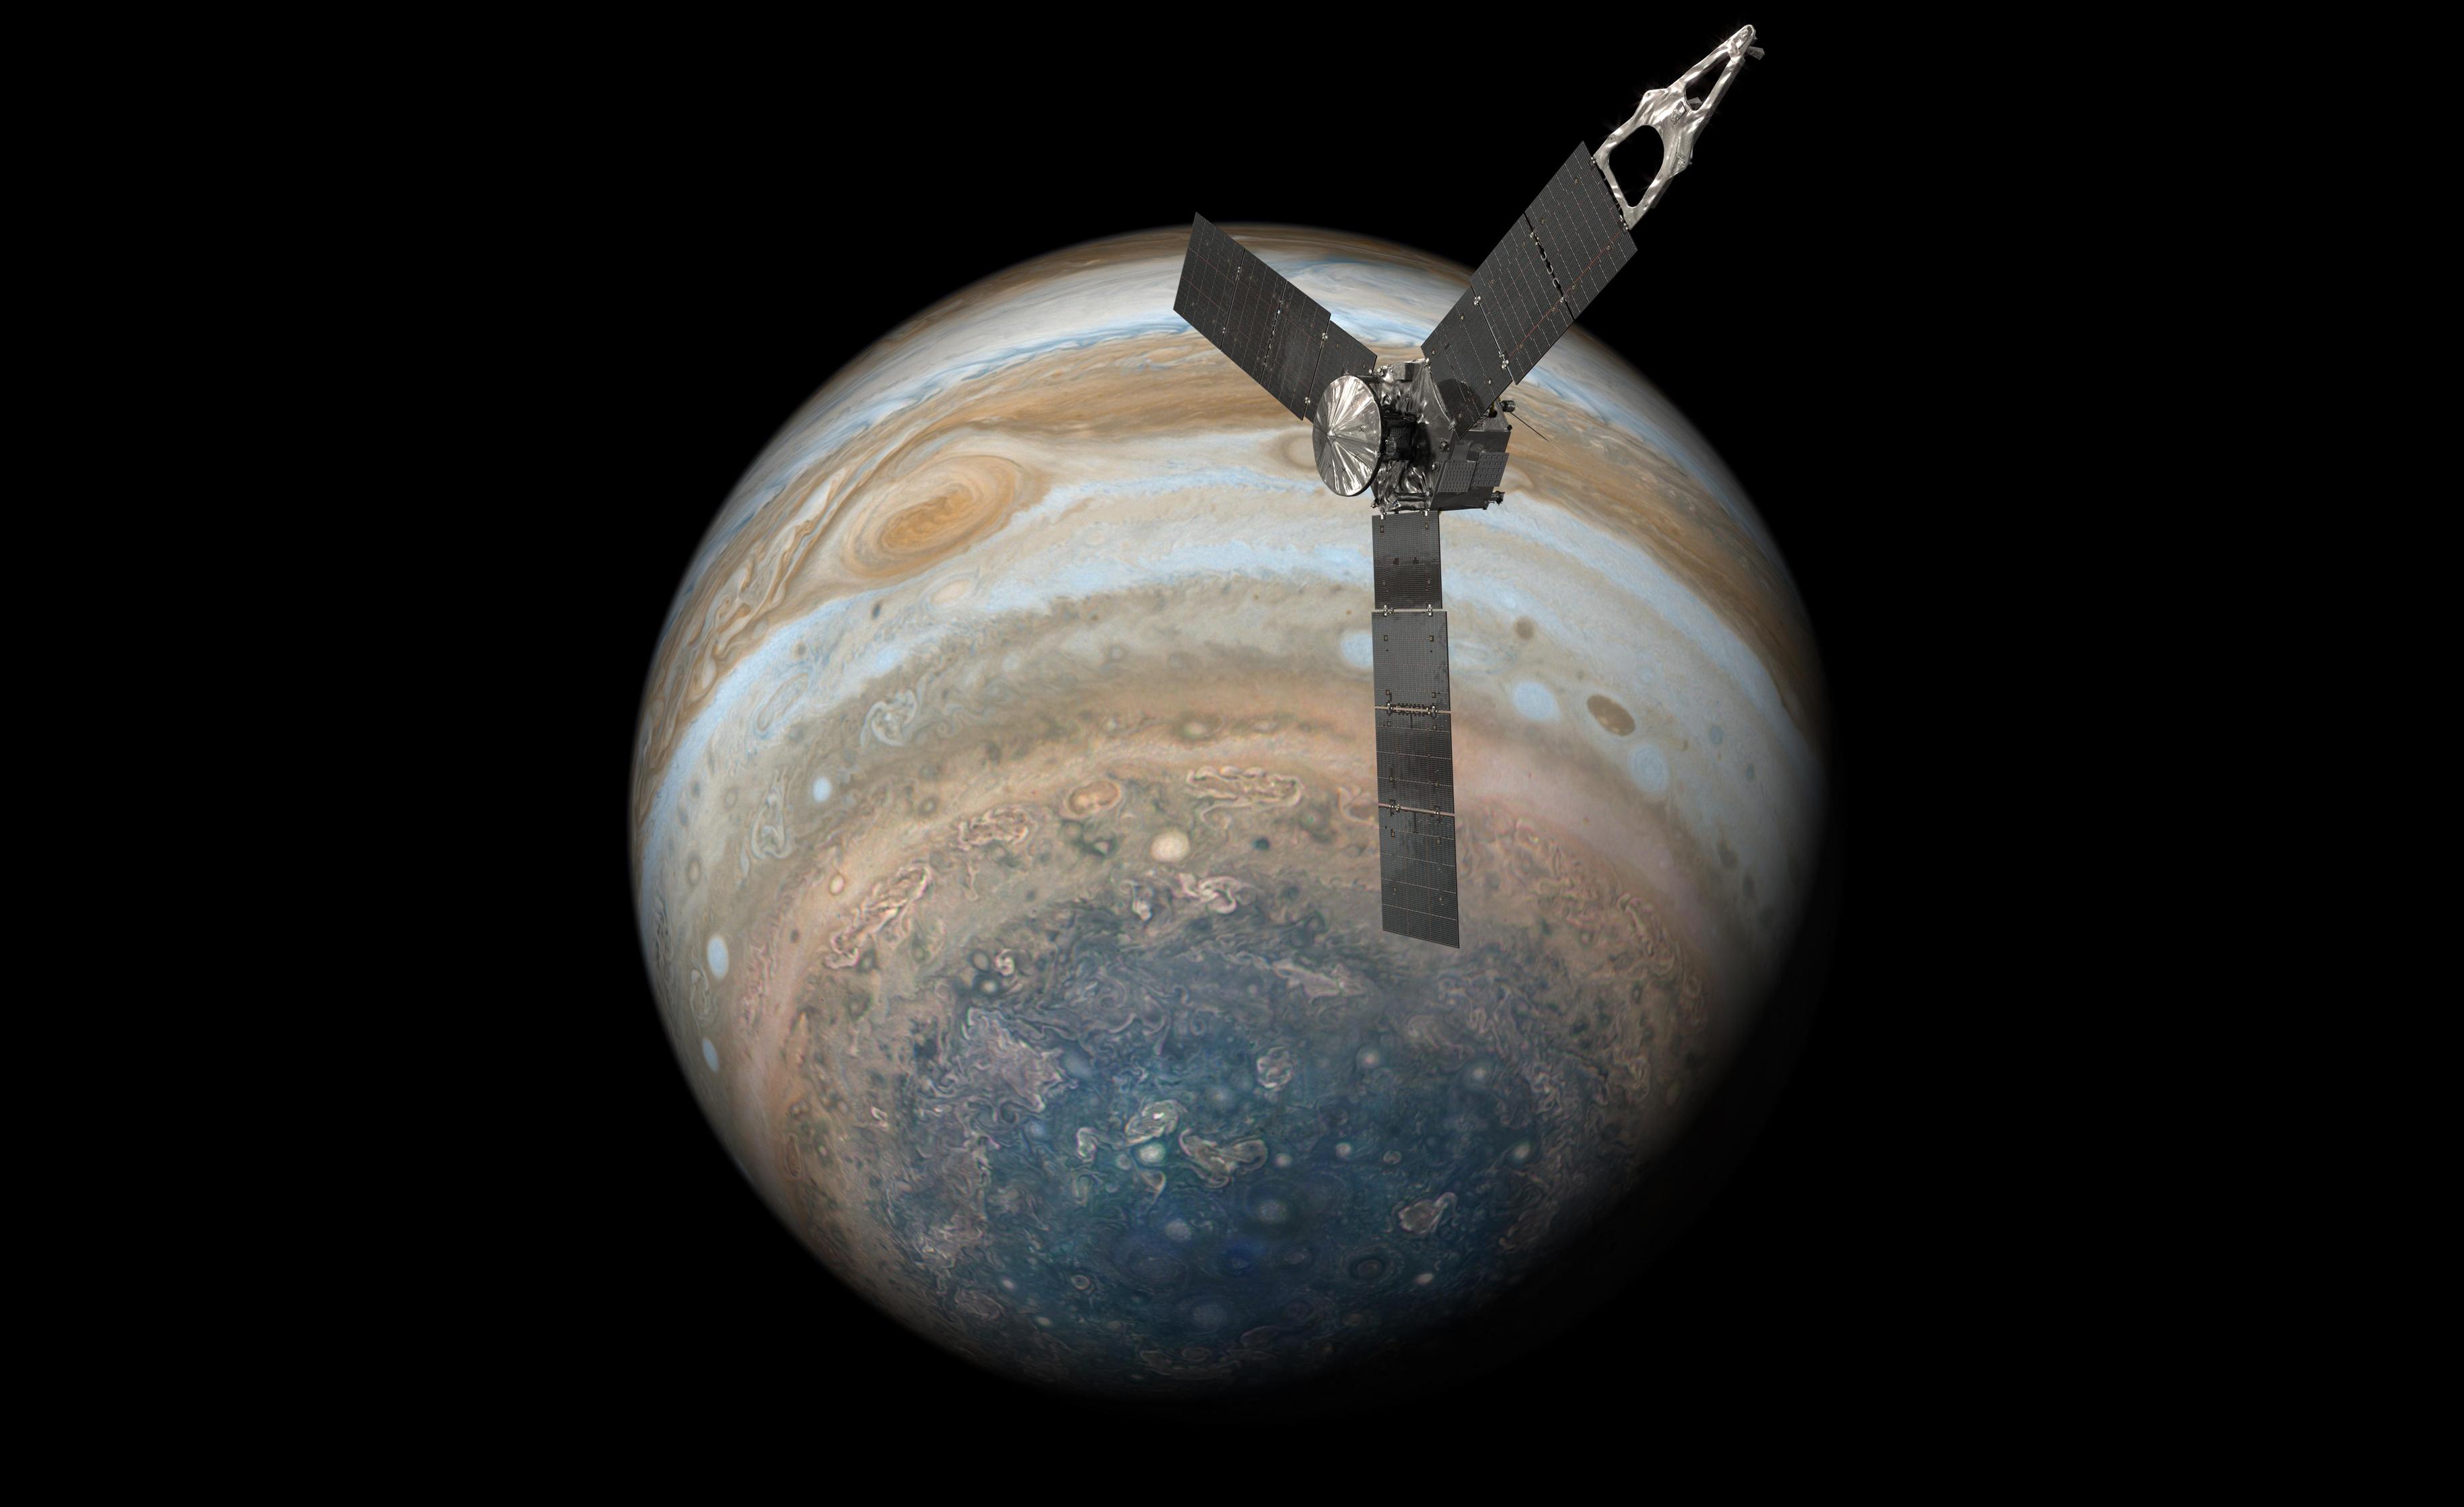 What's beneath Jupiter's cloud cover? NASA's Juno takes a sneak peek